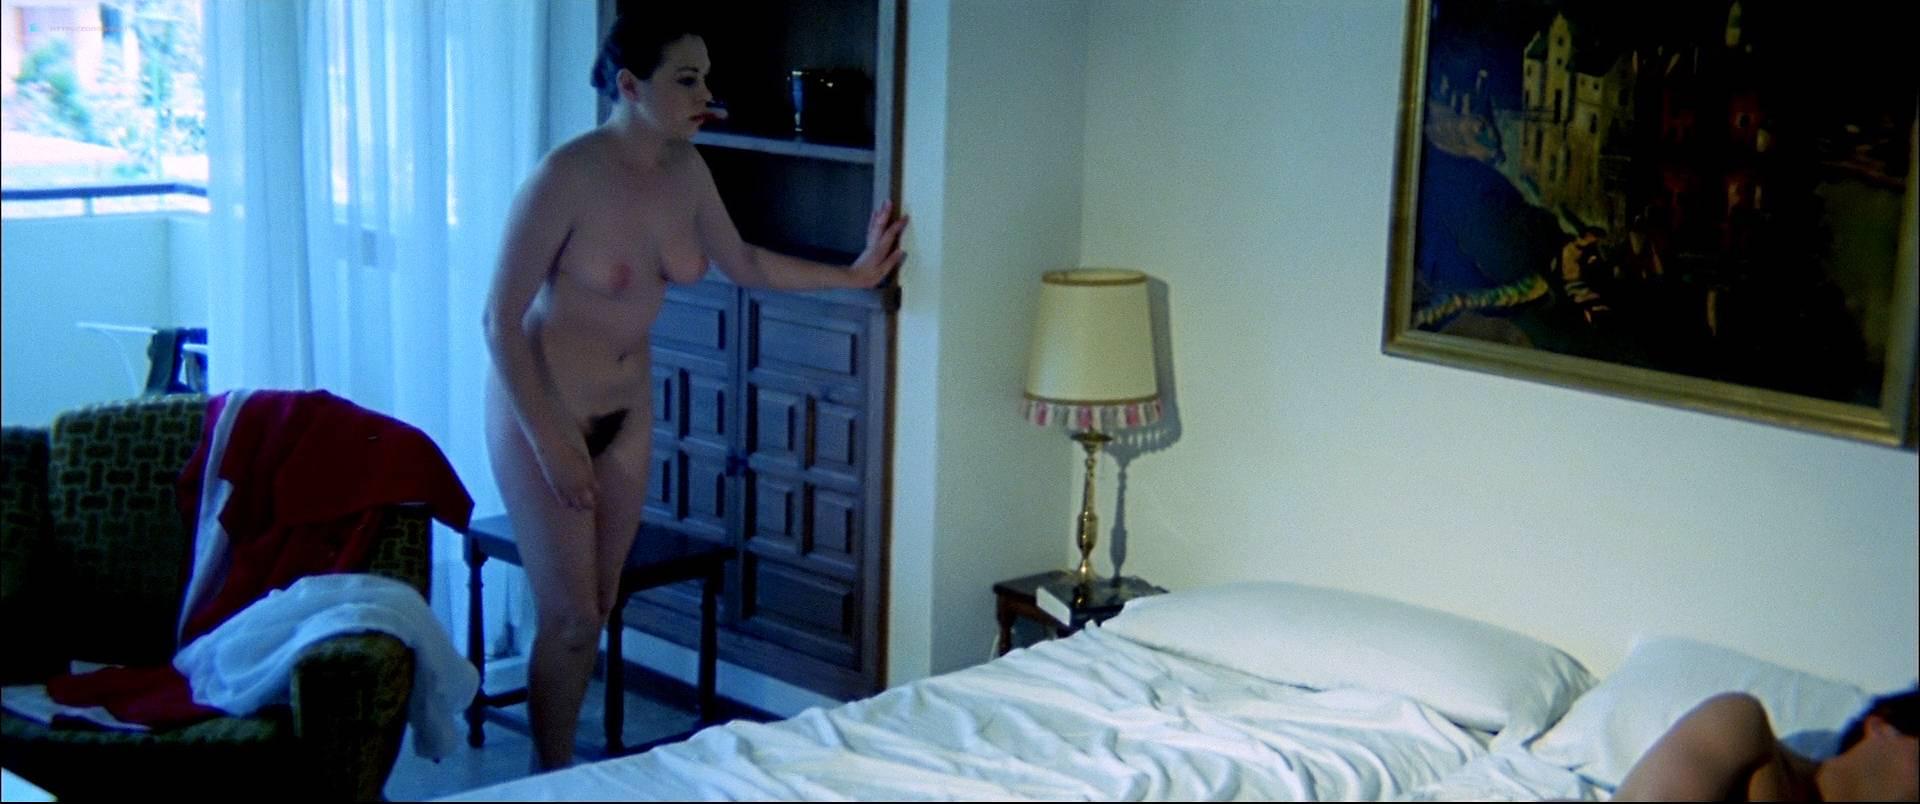 Lina Romay nude full frontal Mari Carmen Nieto, Alicia Príncipe nude too - Night of 1,000 Sexes (SP-1984) HD 1080p BluRay (10)